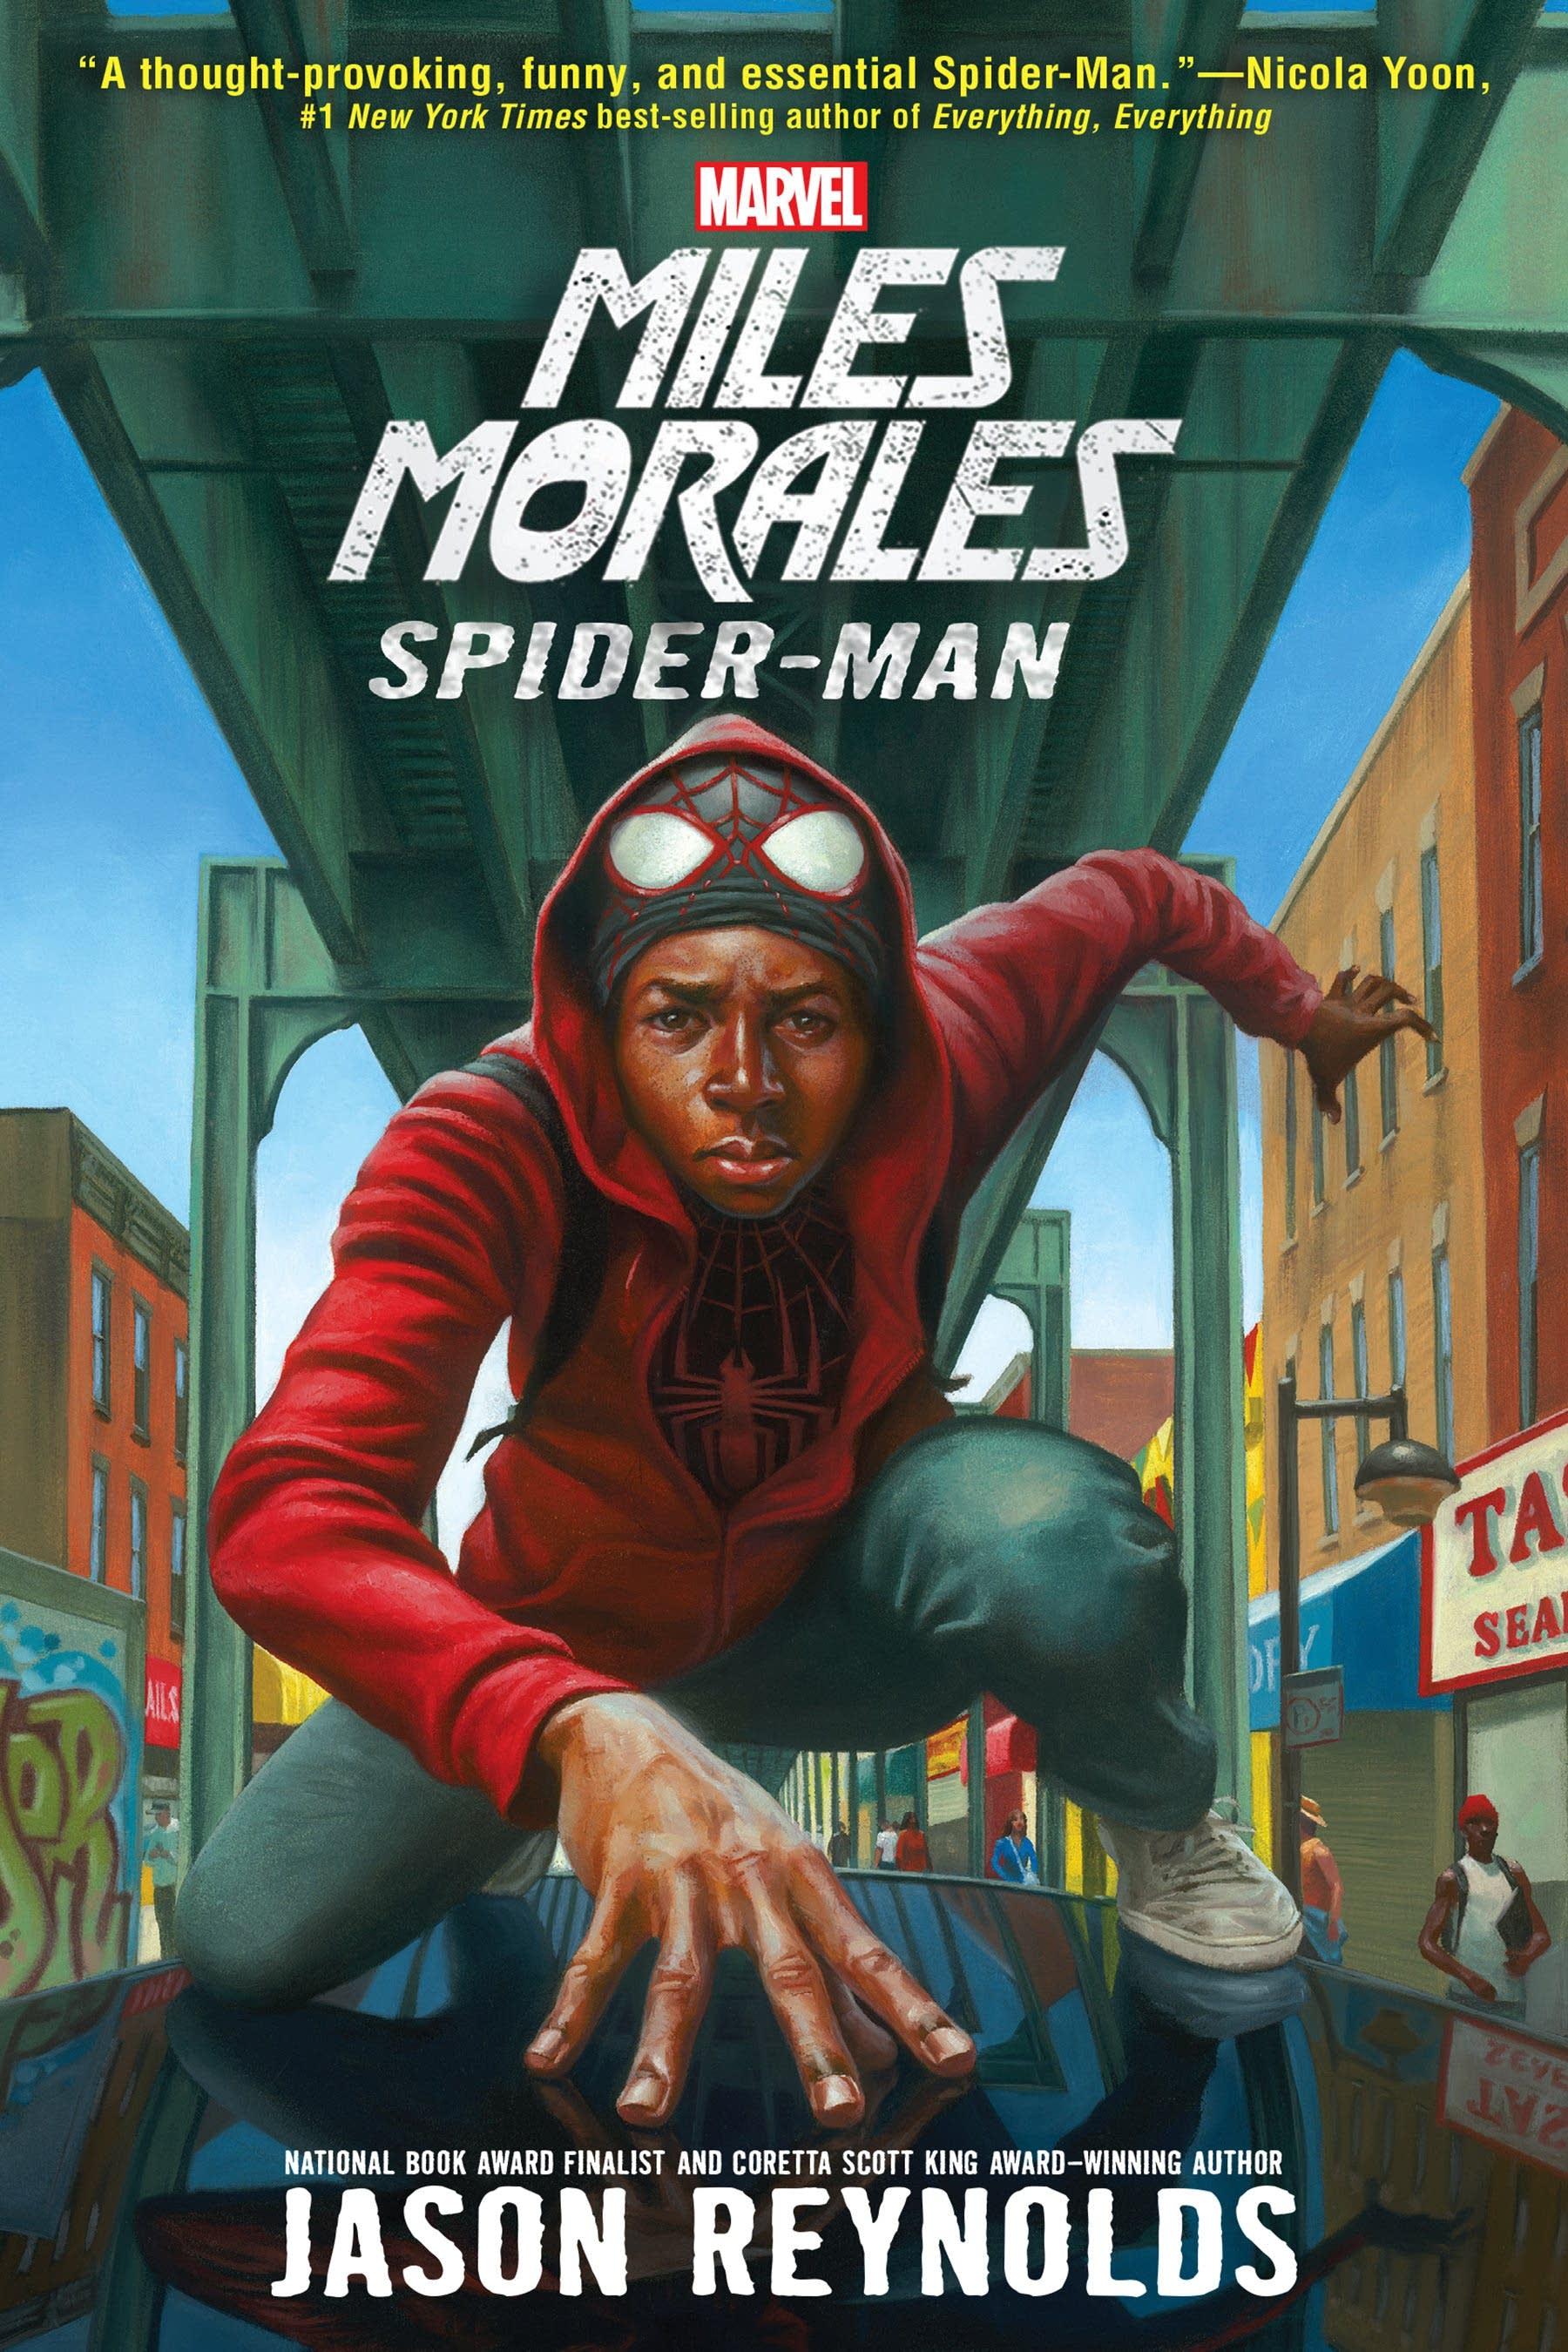 'Miles Morales: Spiderman' by Jason Reynolds